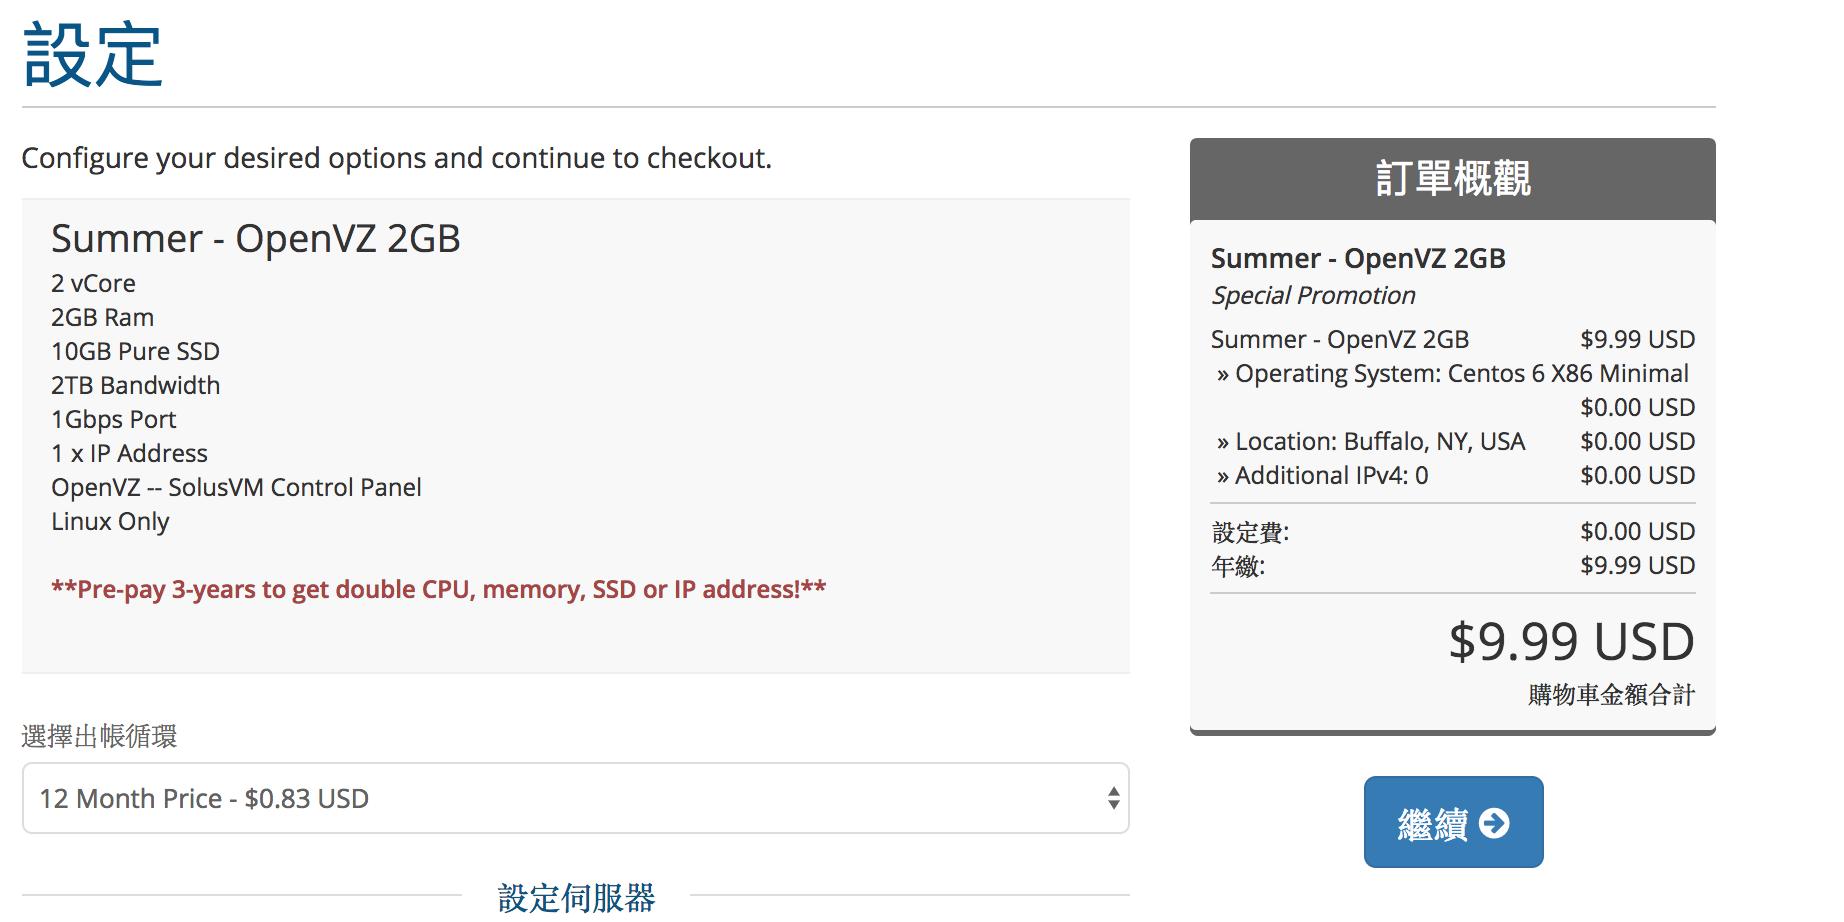 HiFormance - 亚洲优化!支持-支付宝、微信付款-年付9.99美元 10G-SSD 2G内存--支持中文